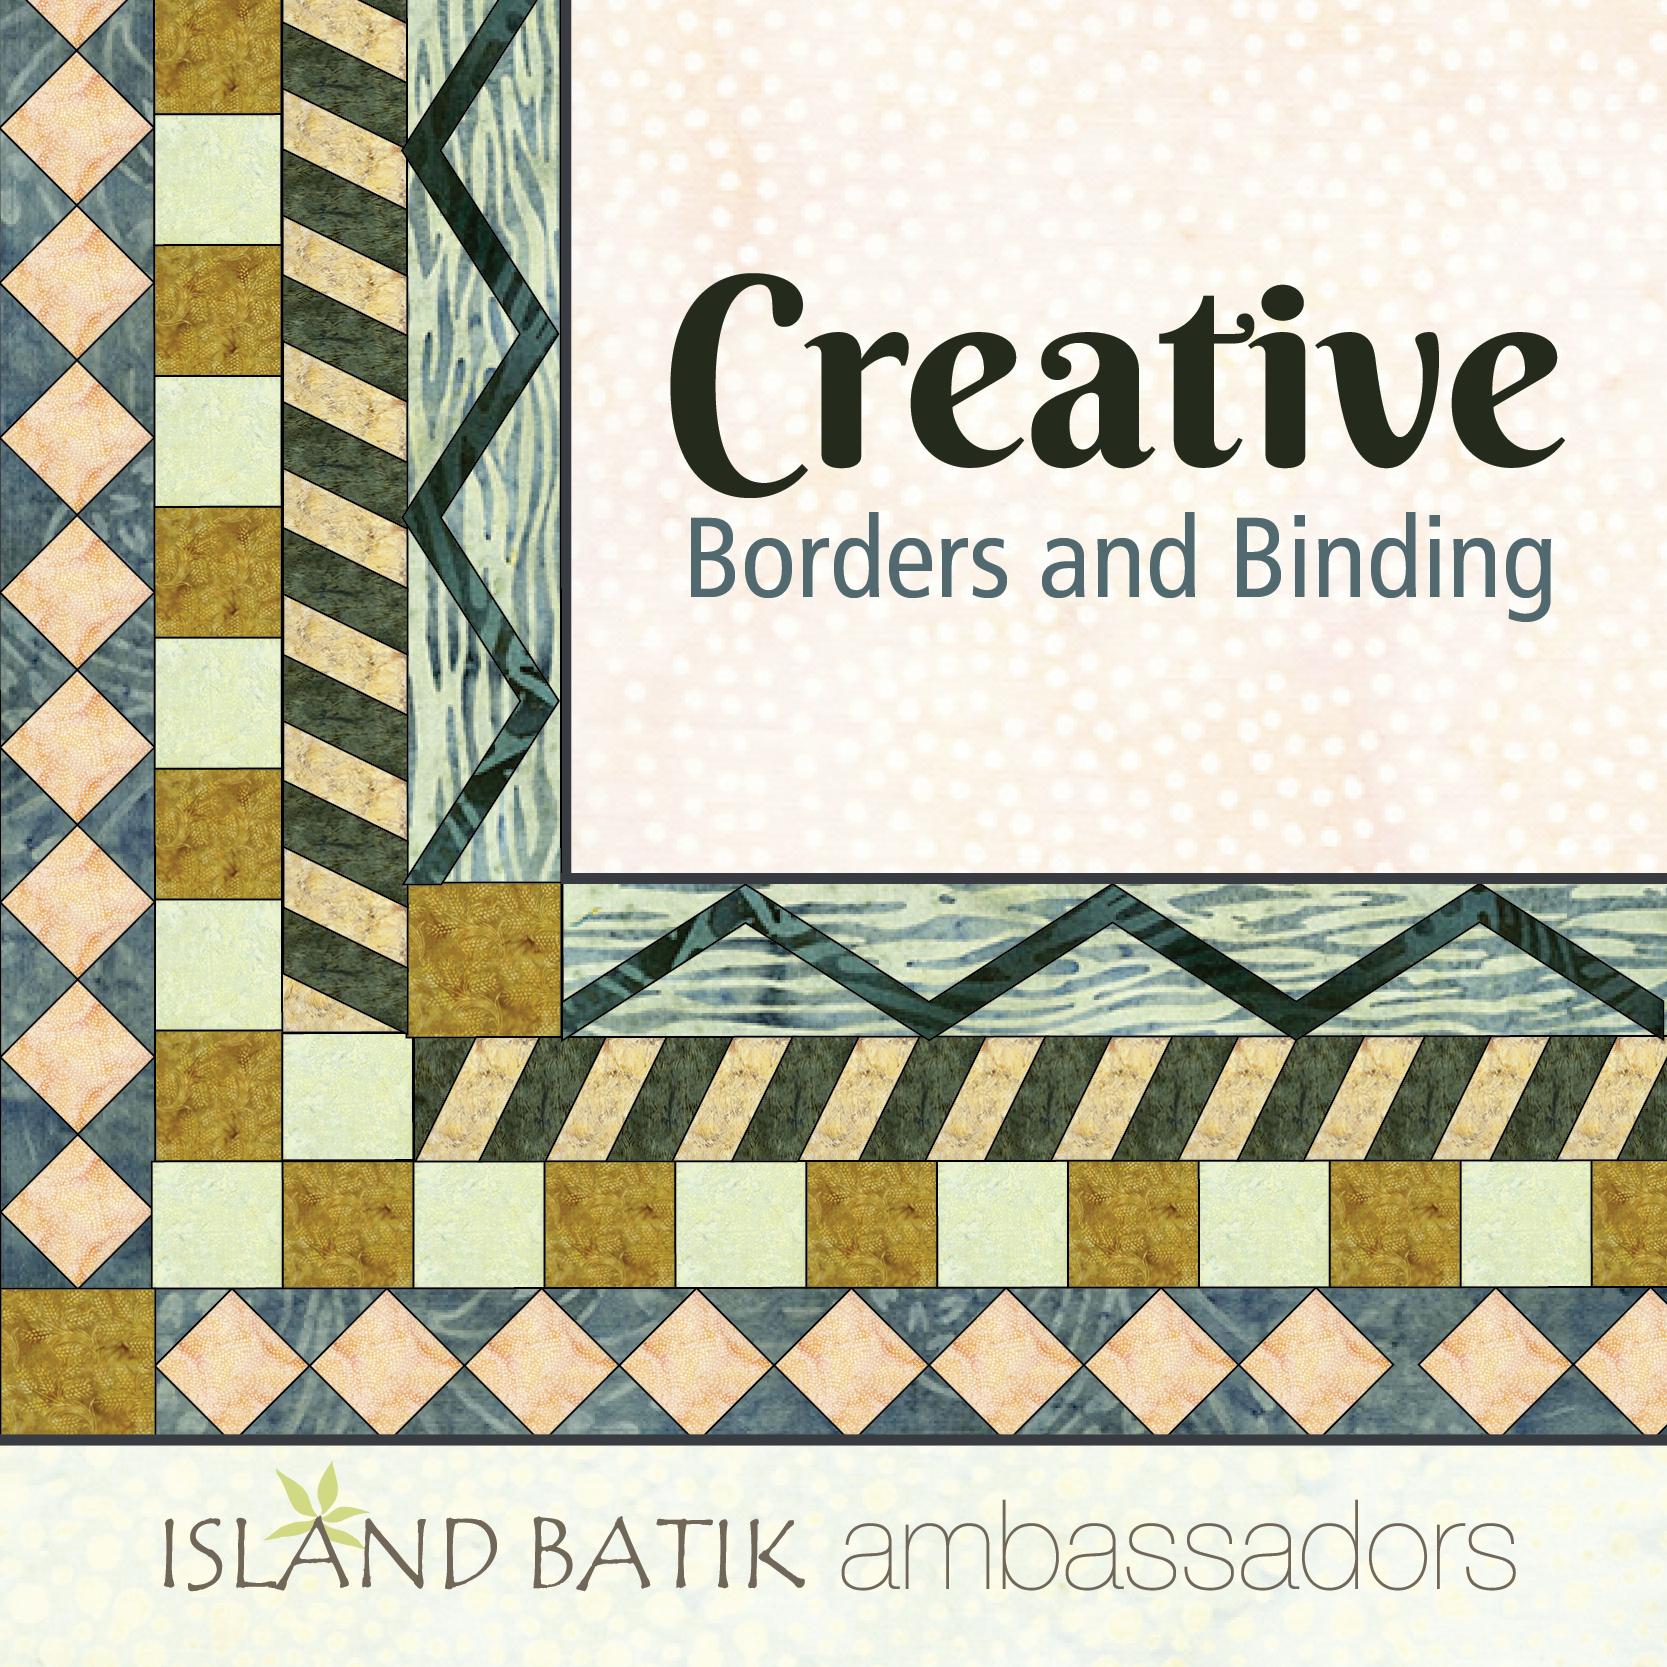 Creative Borders and Binding Graphic.jpg